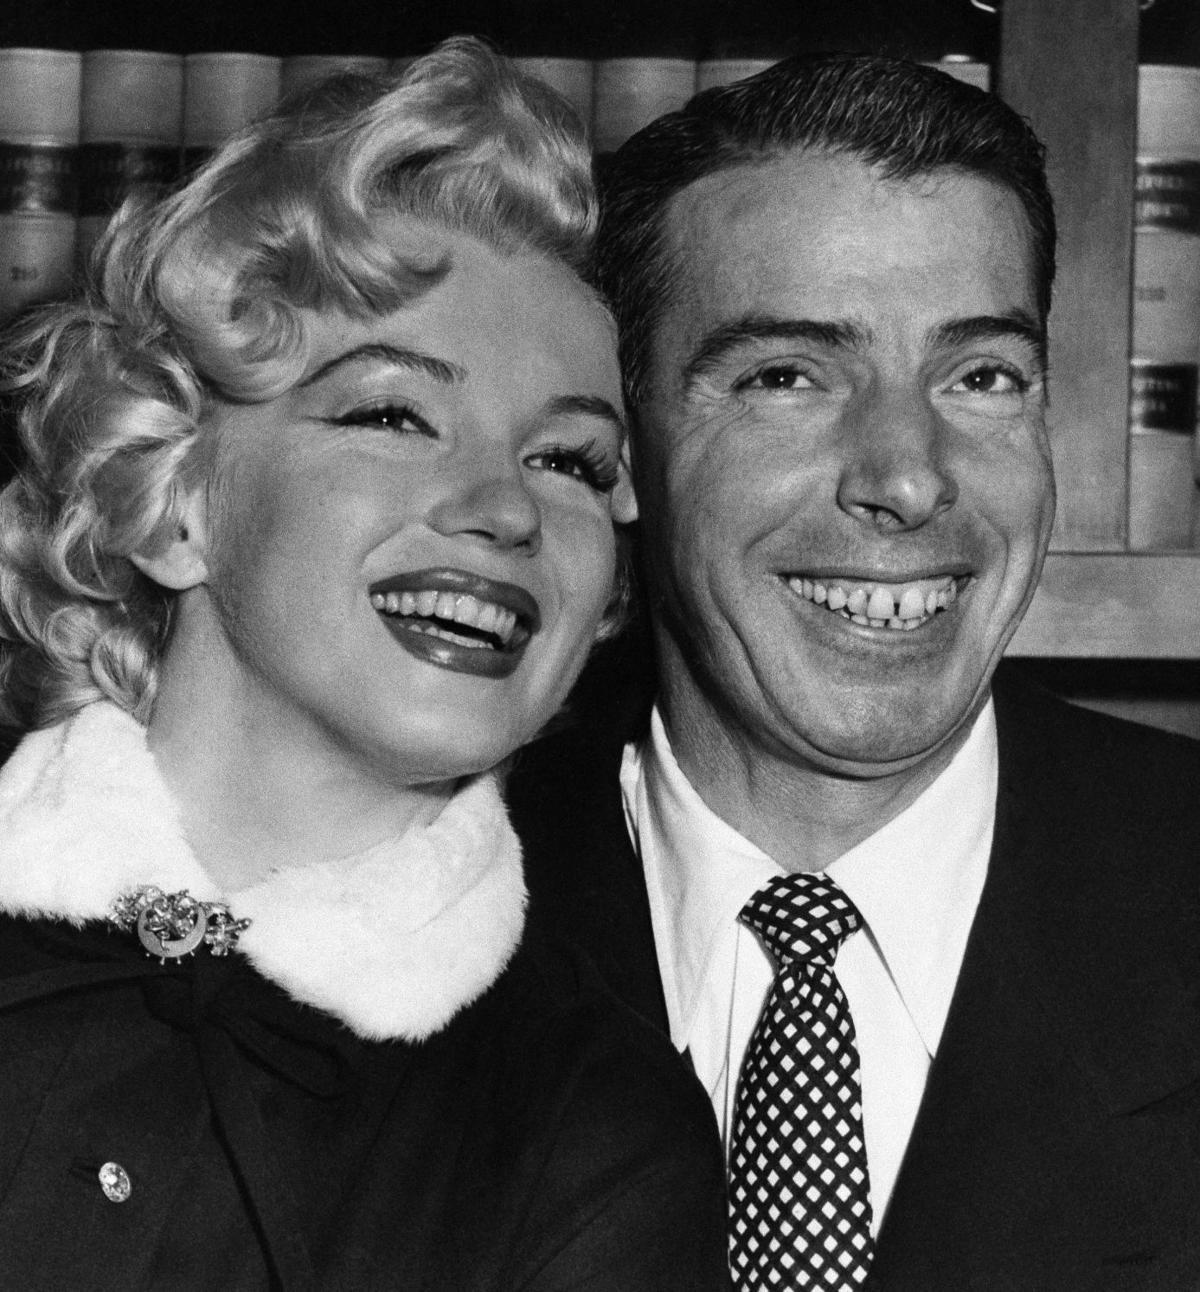 Harrison, Hepburn & Monroe: A look at this week's historic wedding photos